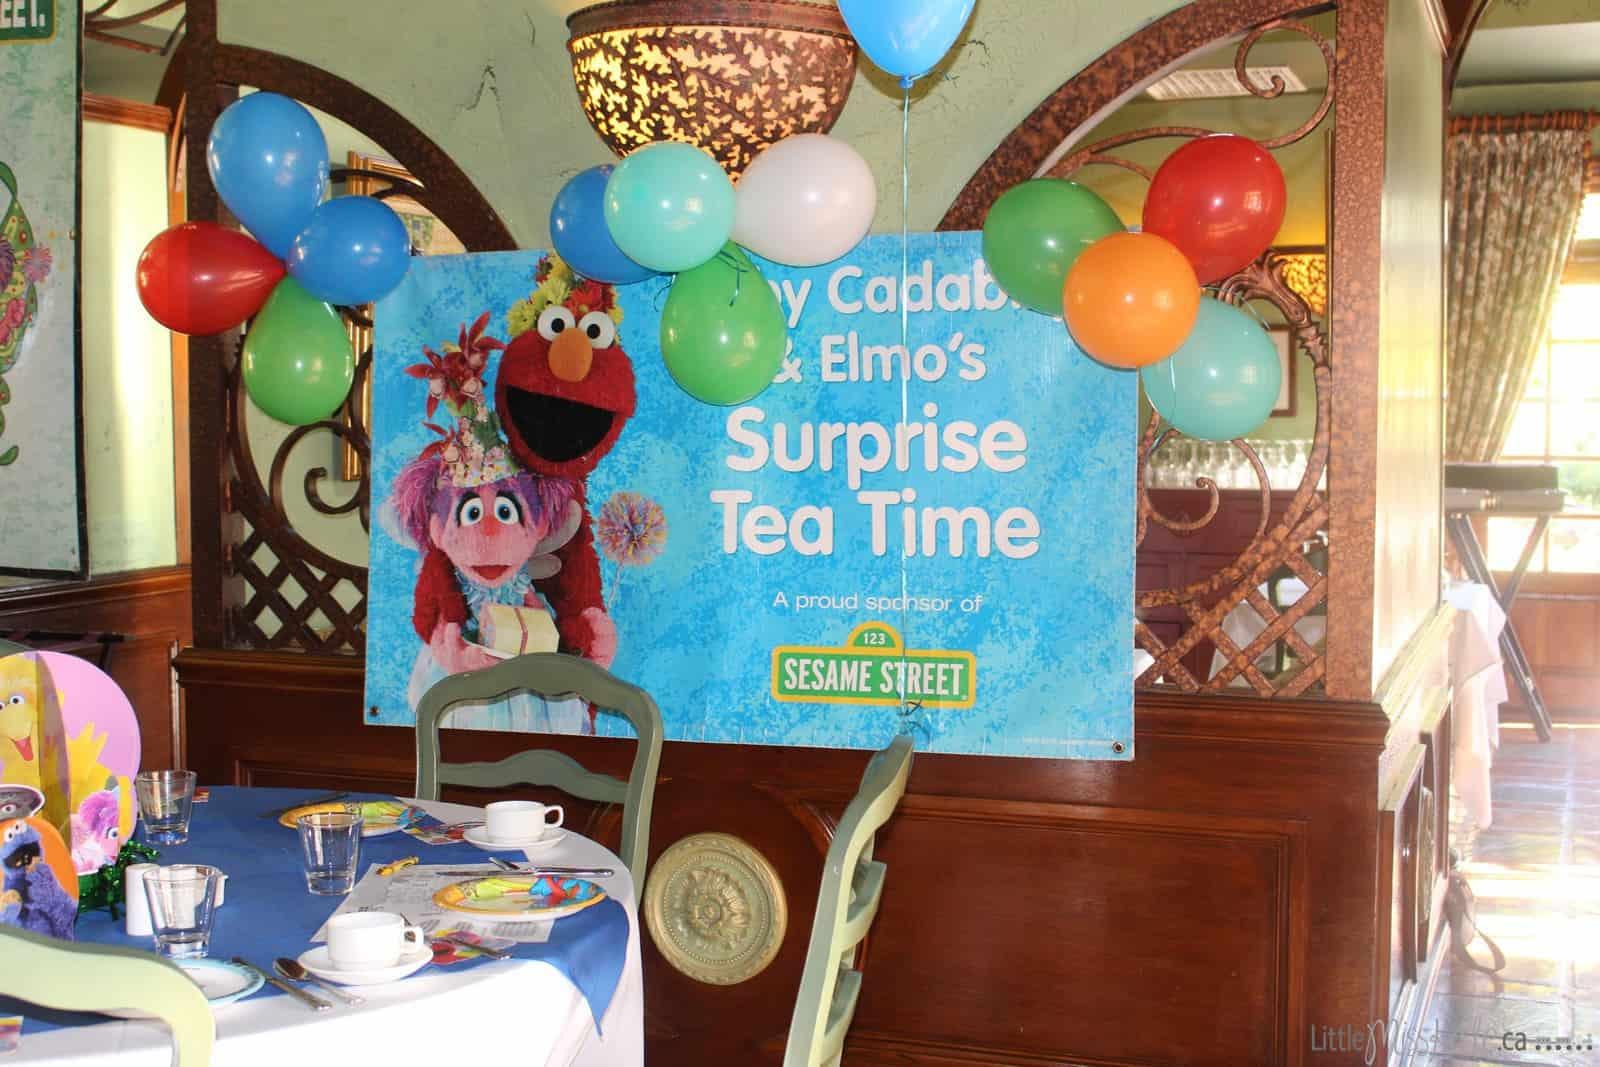 Beaches resort Turks and Caicos Sesame Street Character Breakfast via www.littlemisskate.ca